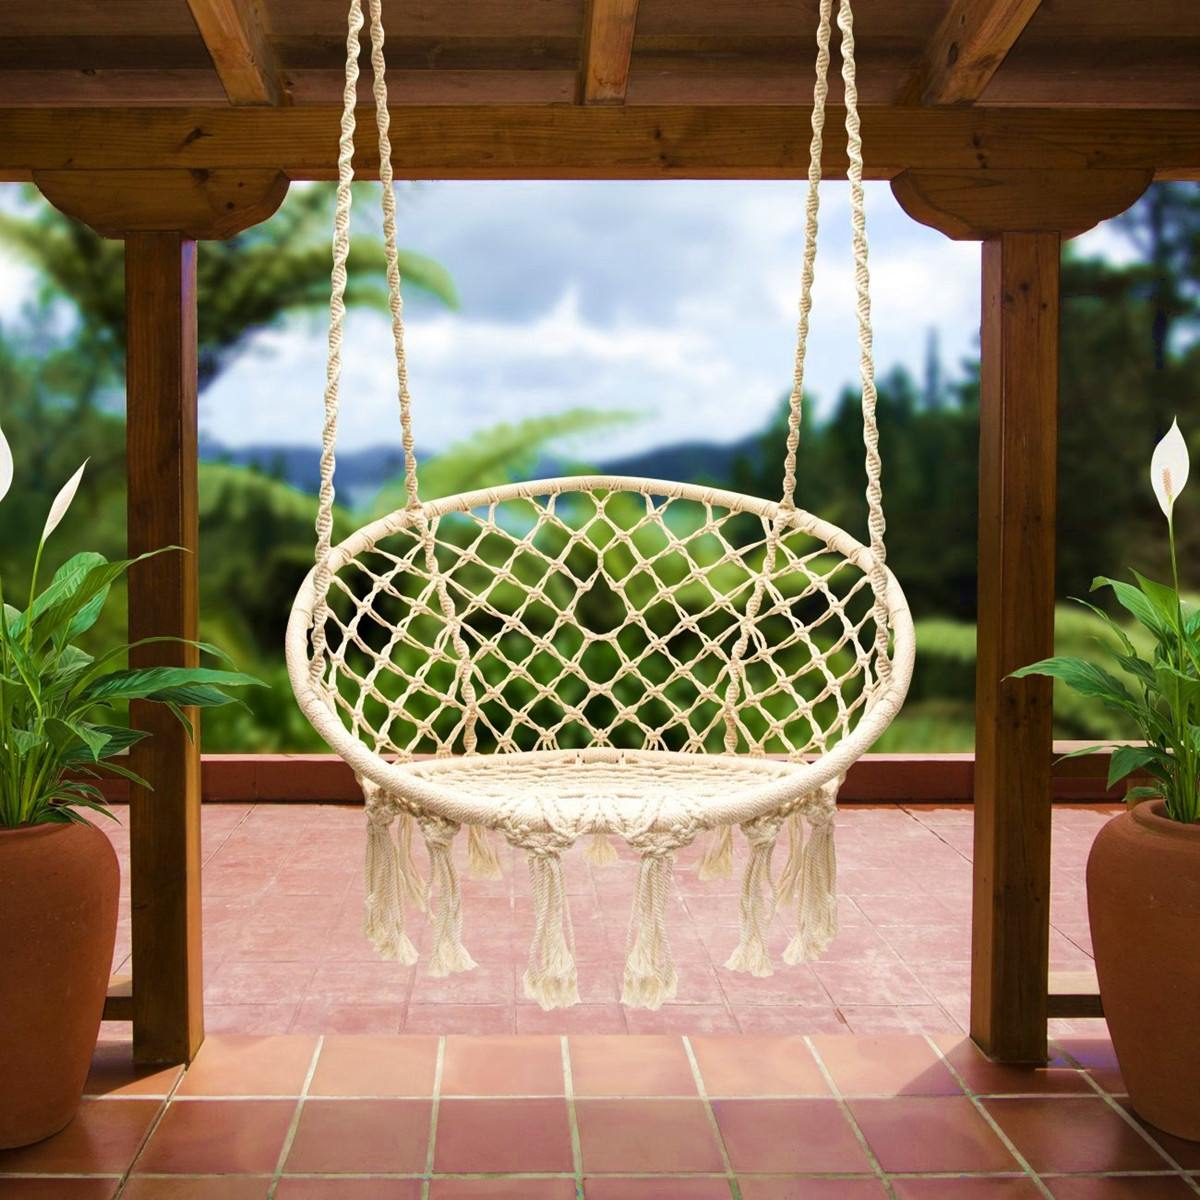 Handmade Knitted Round Hammock Outdoor Indoor Swing Bed Chair Hanging Comfort V3